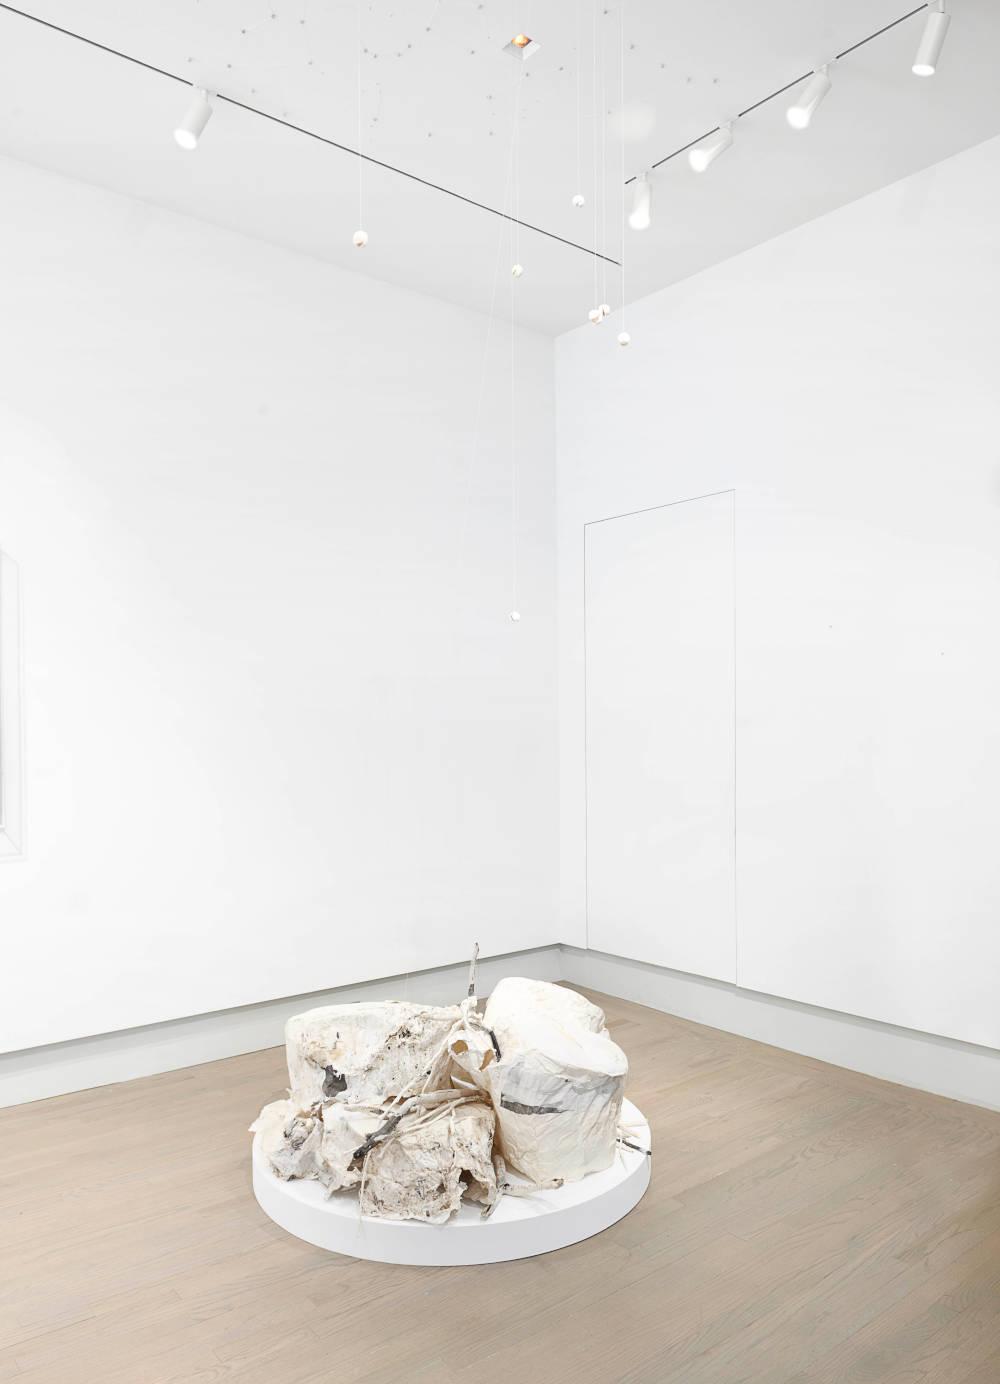 Helwaser Gallery Lin Yan 3